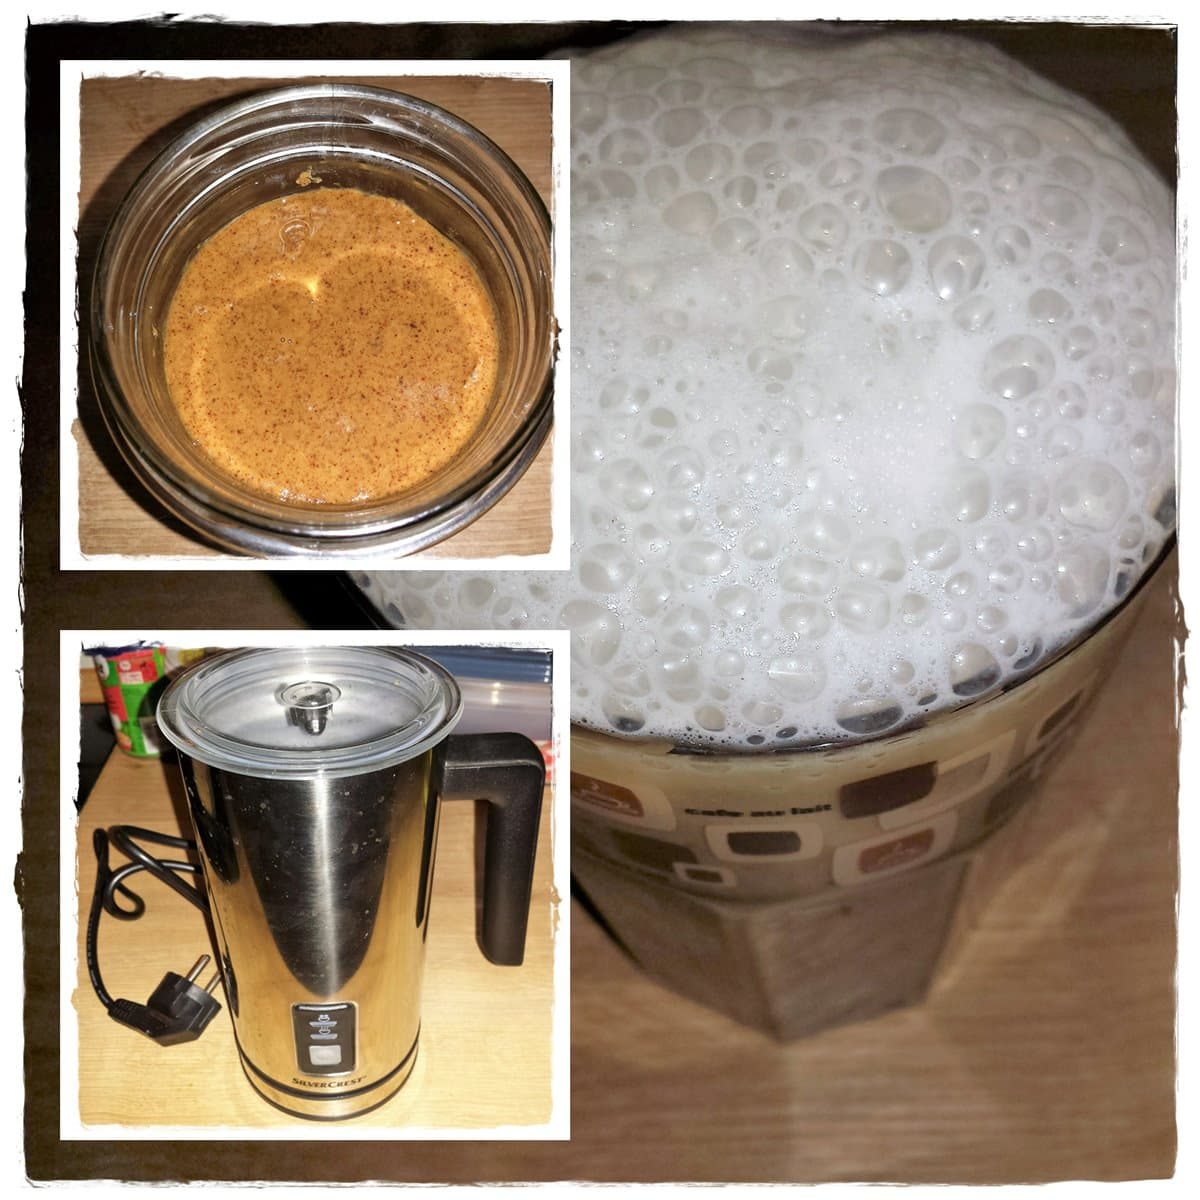 Mandel-Latte-BPC, Bullettproof Kaffee mit Mandelschaum + Mandelmus